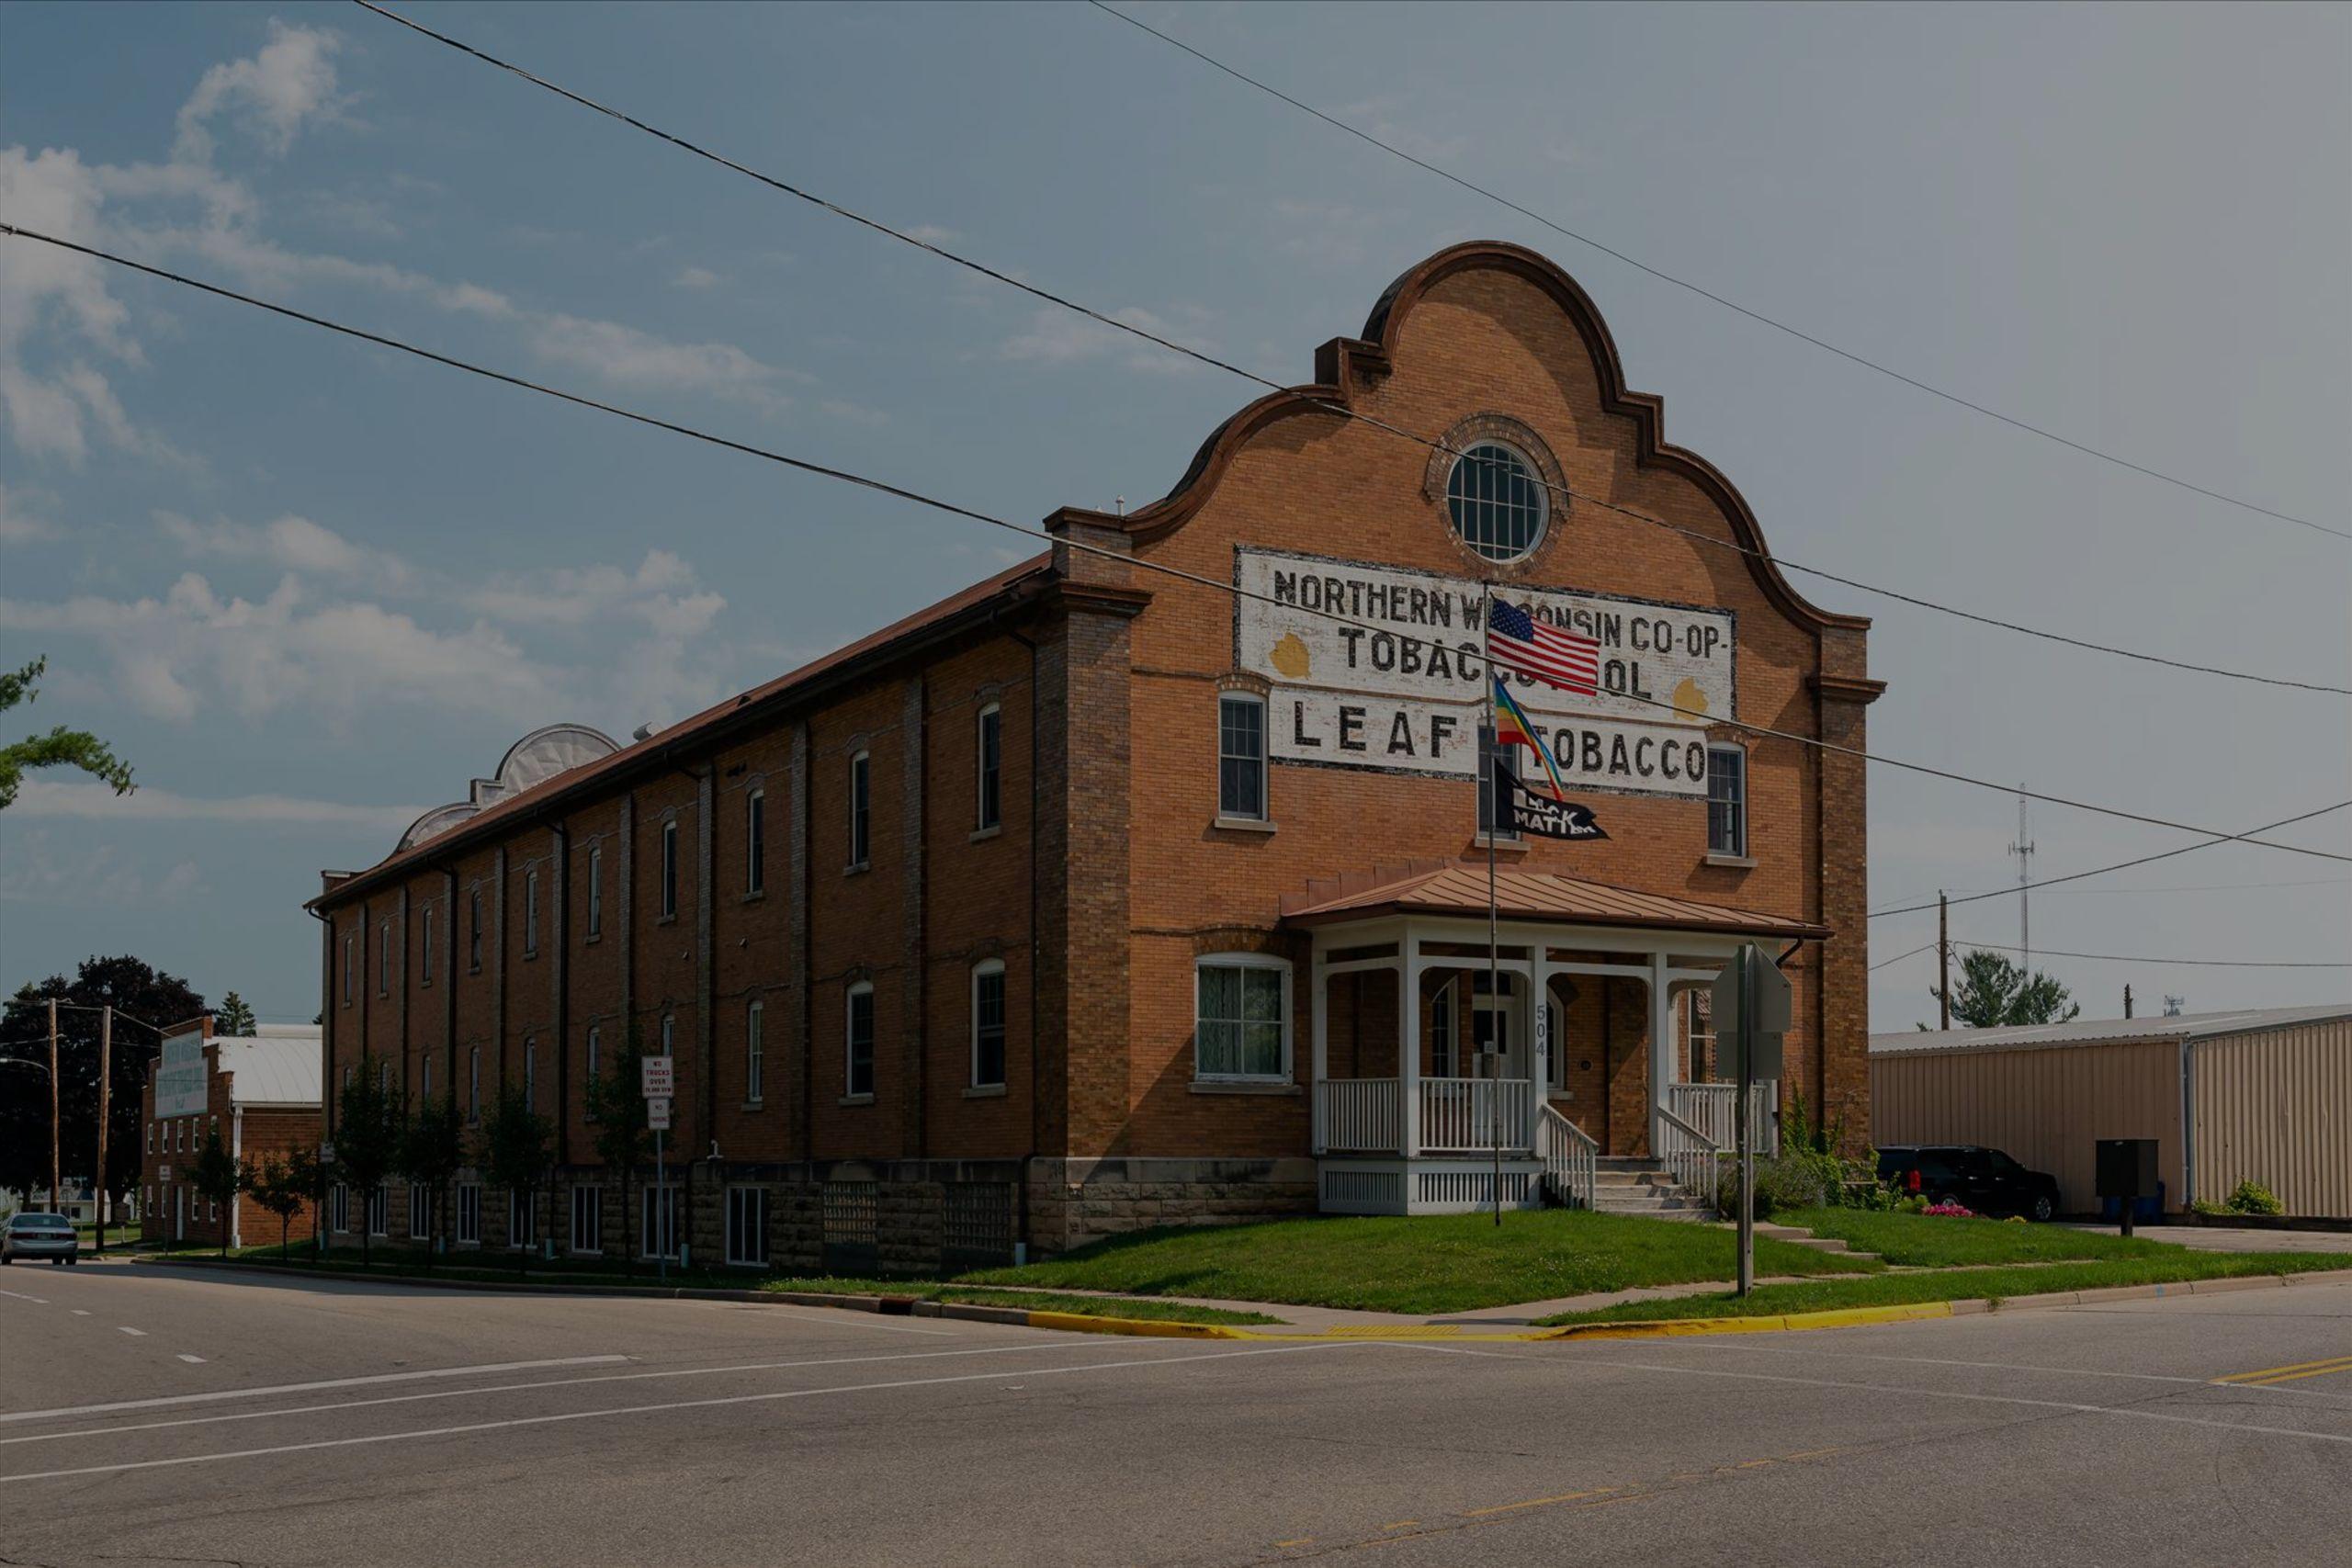 Northern WI Tobacco Building